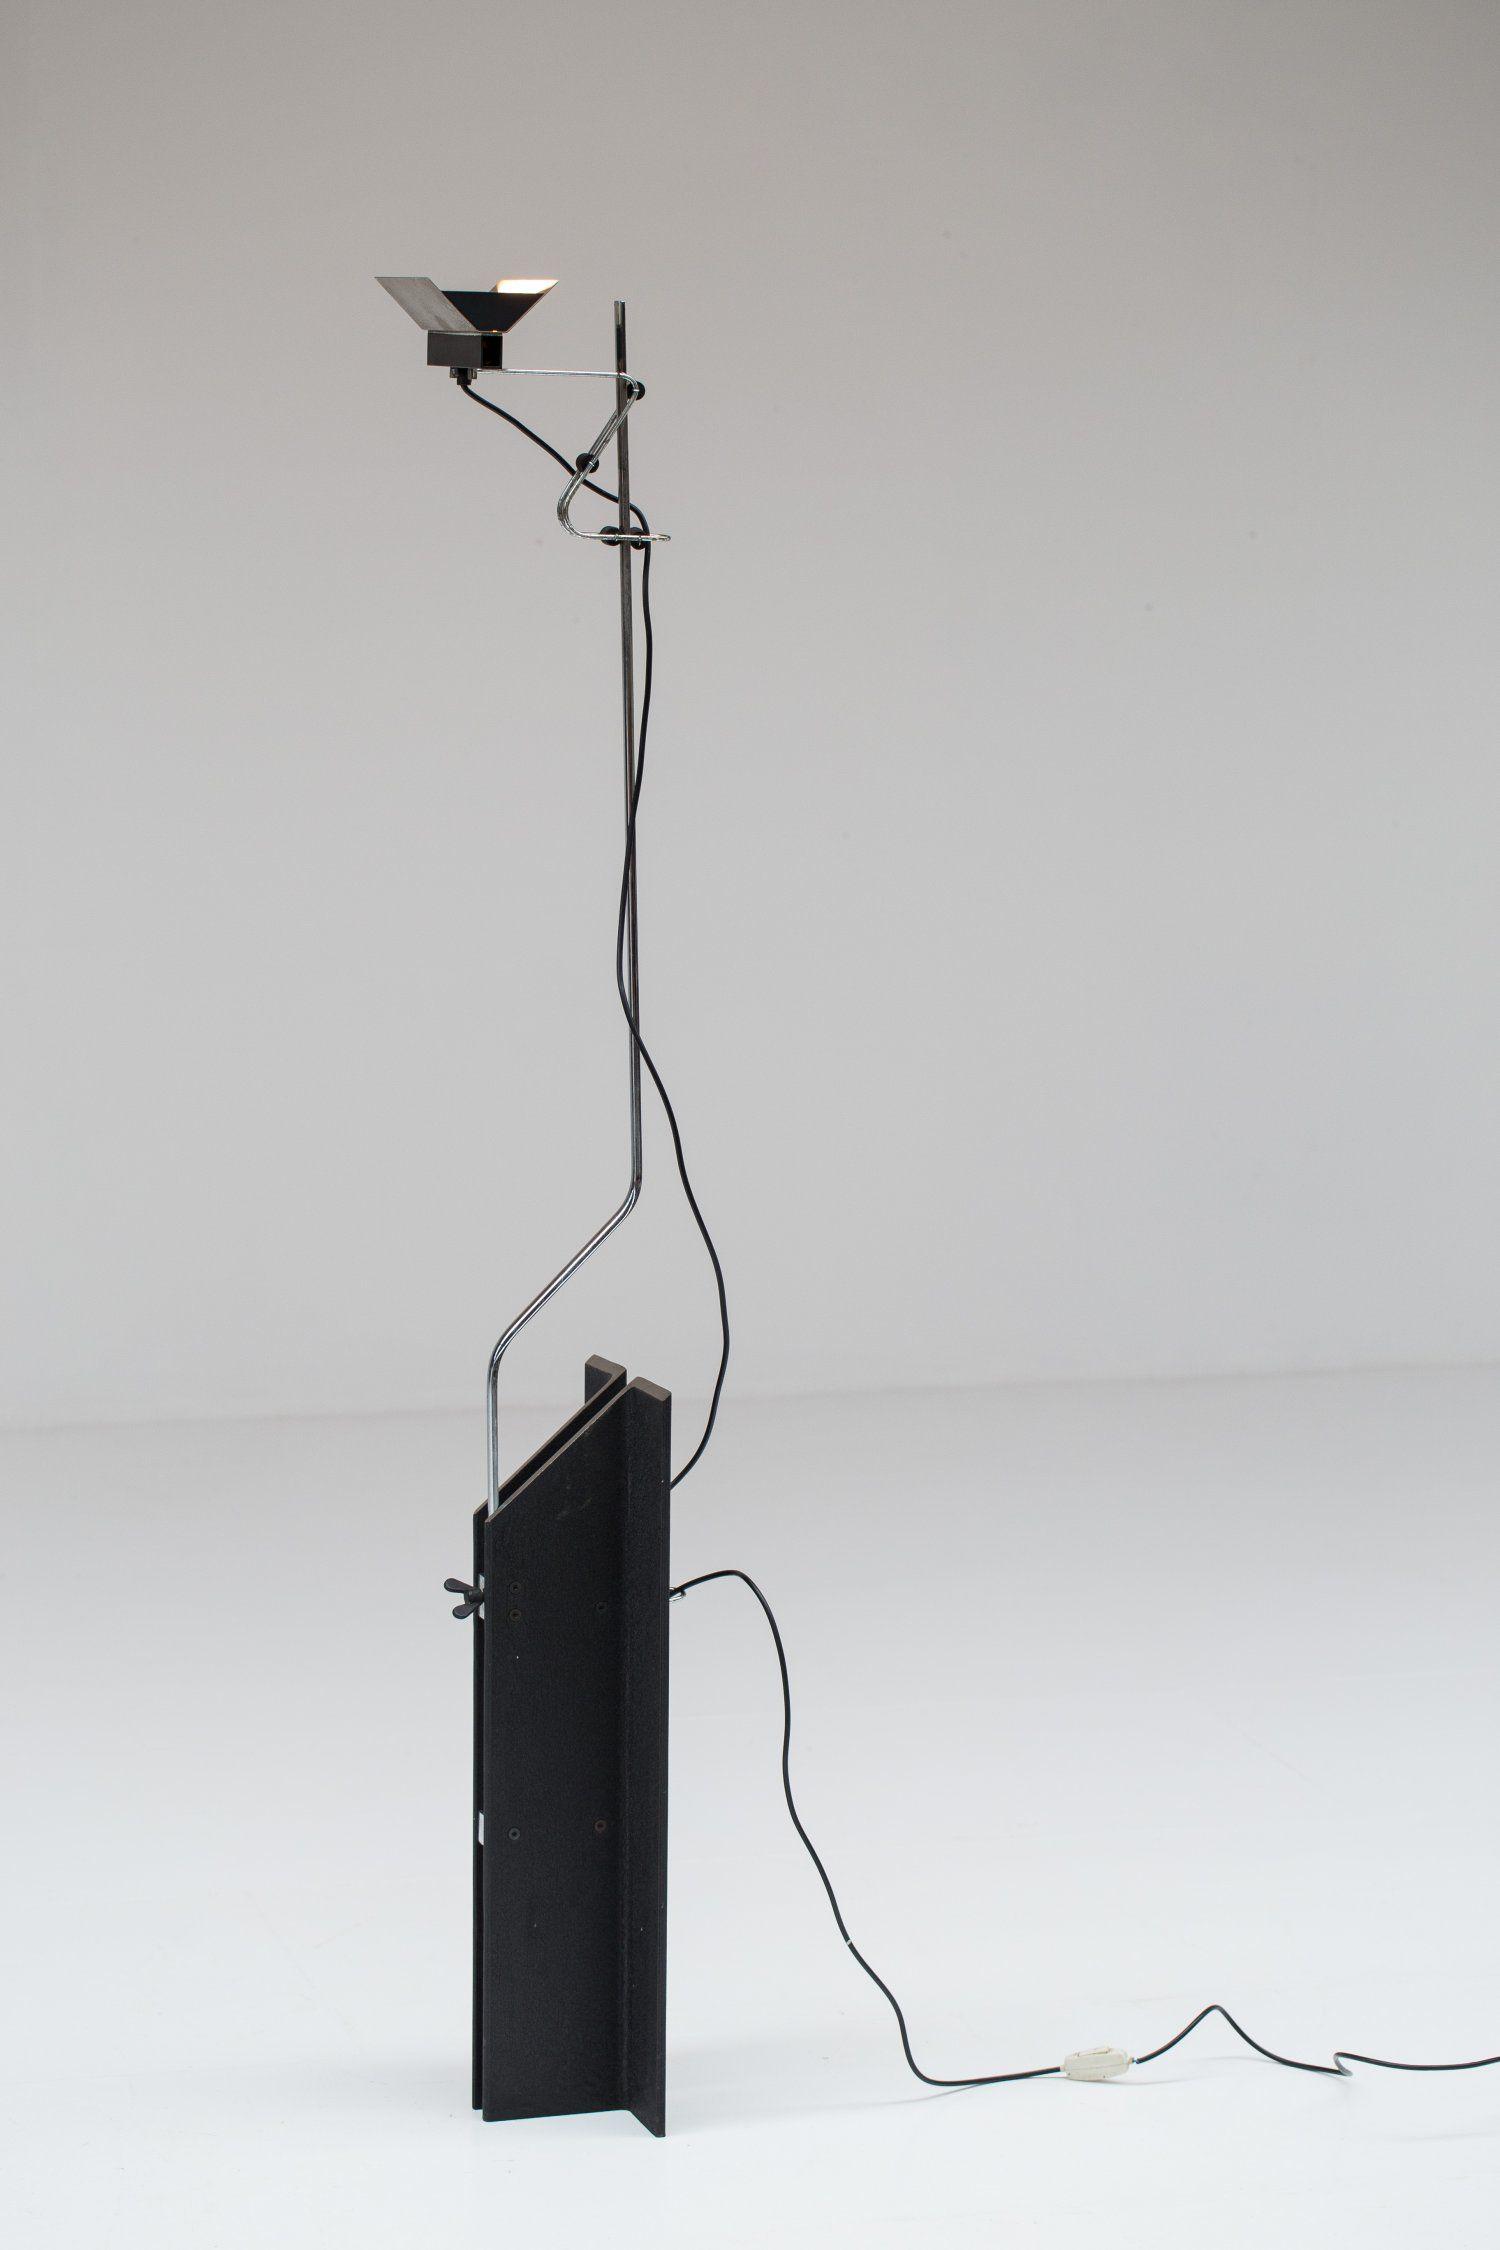 hight resolution of rare floor lamp design ennio chiggio 1968